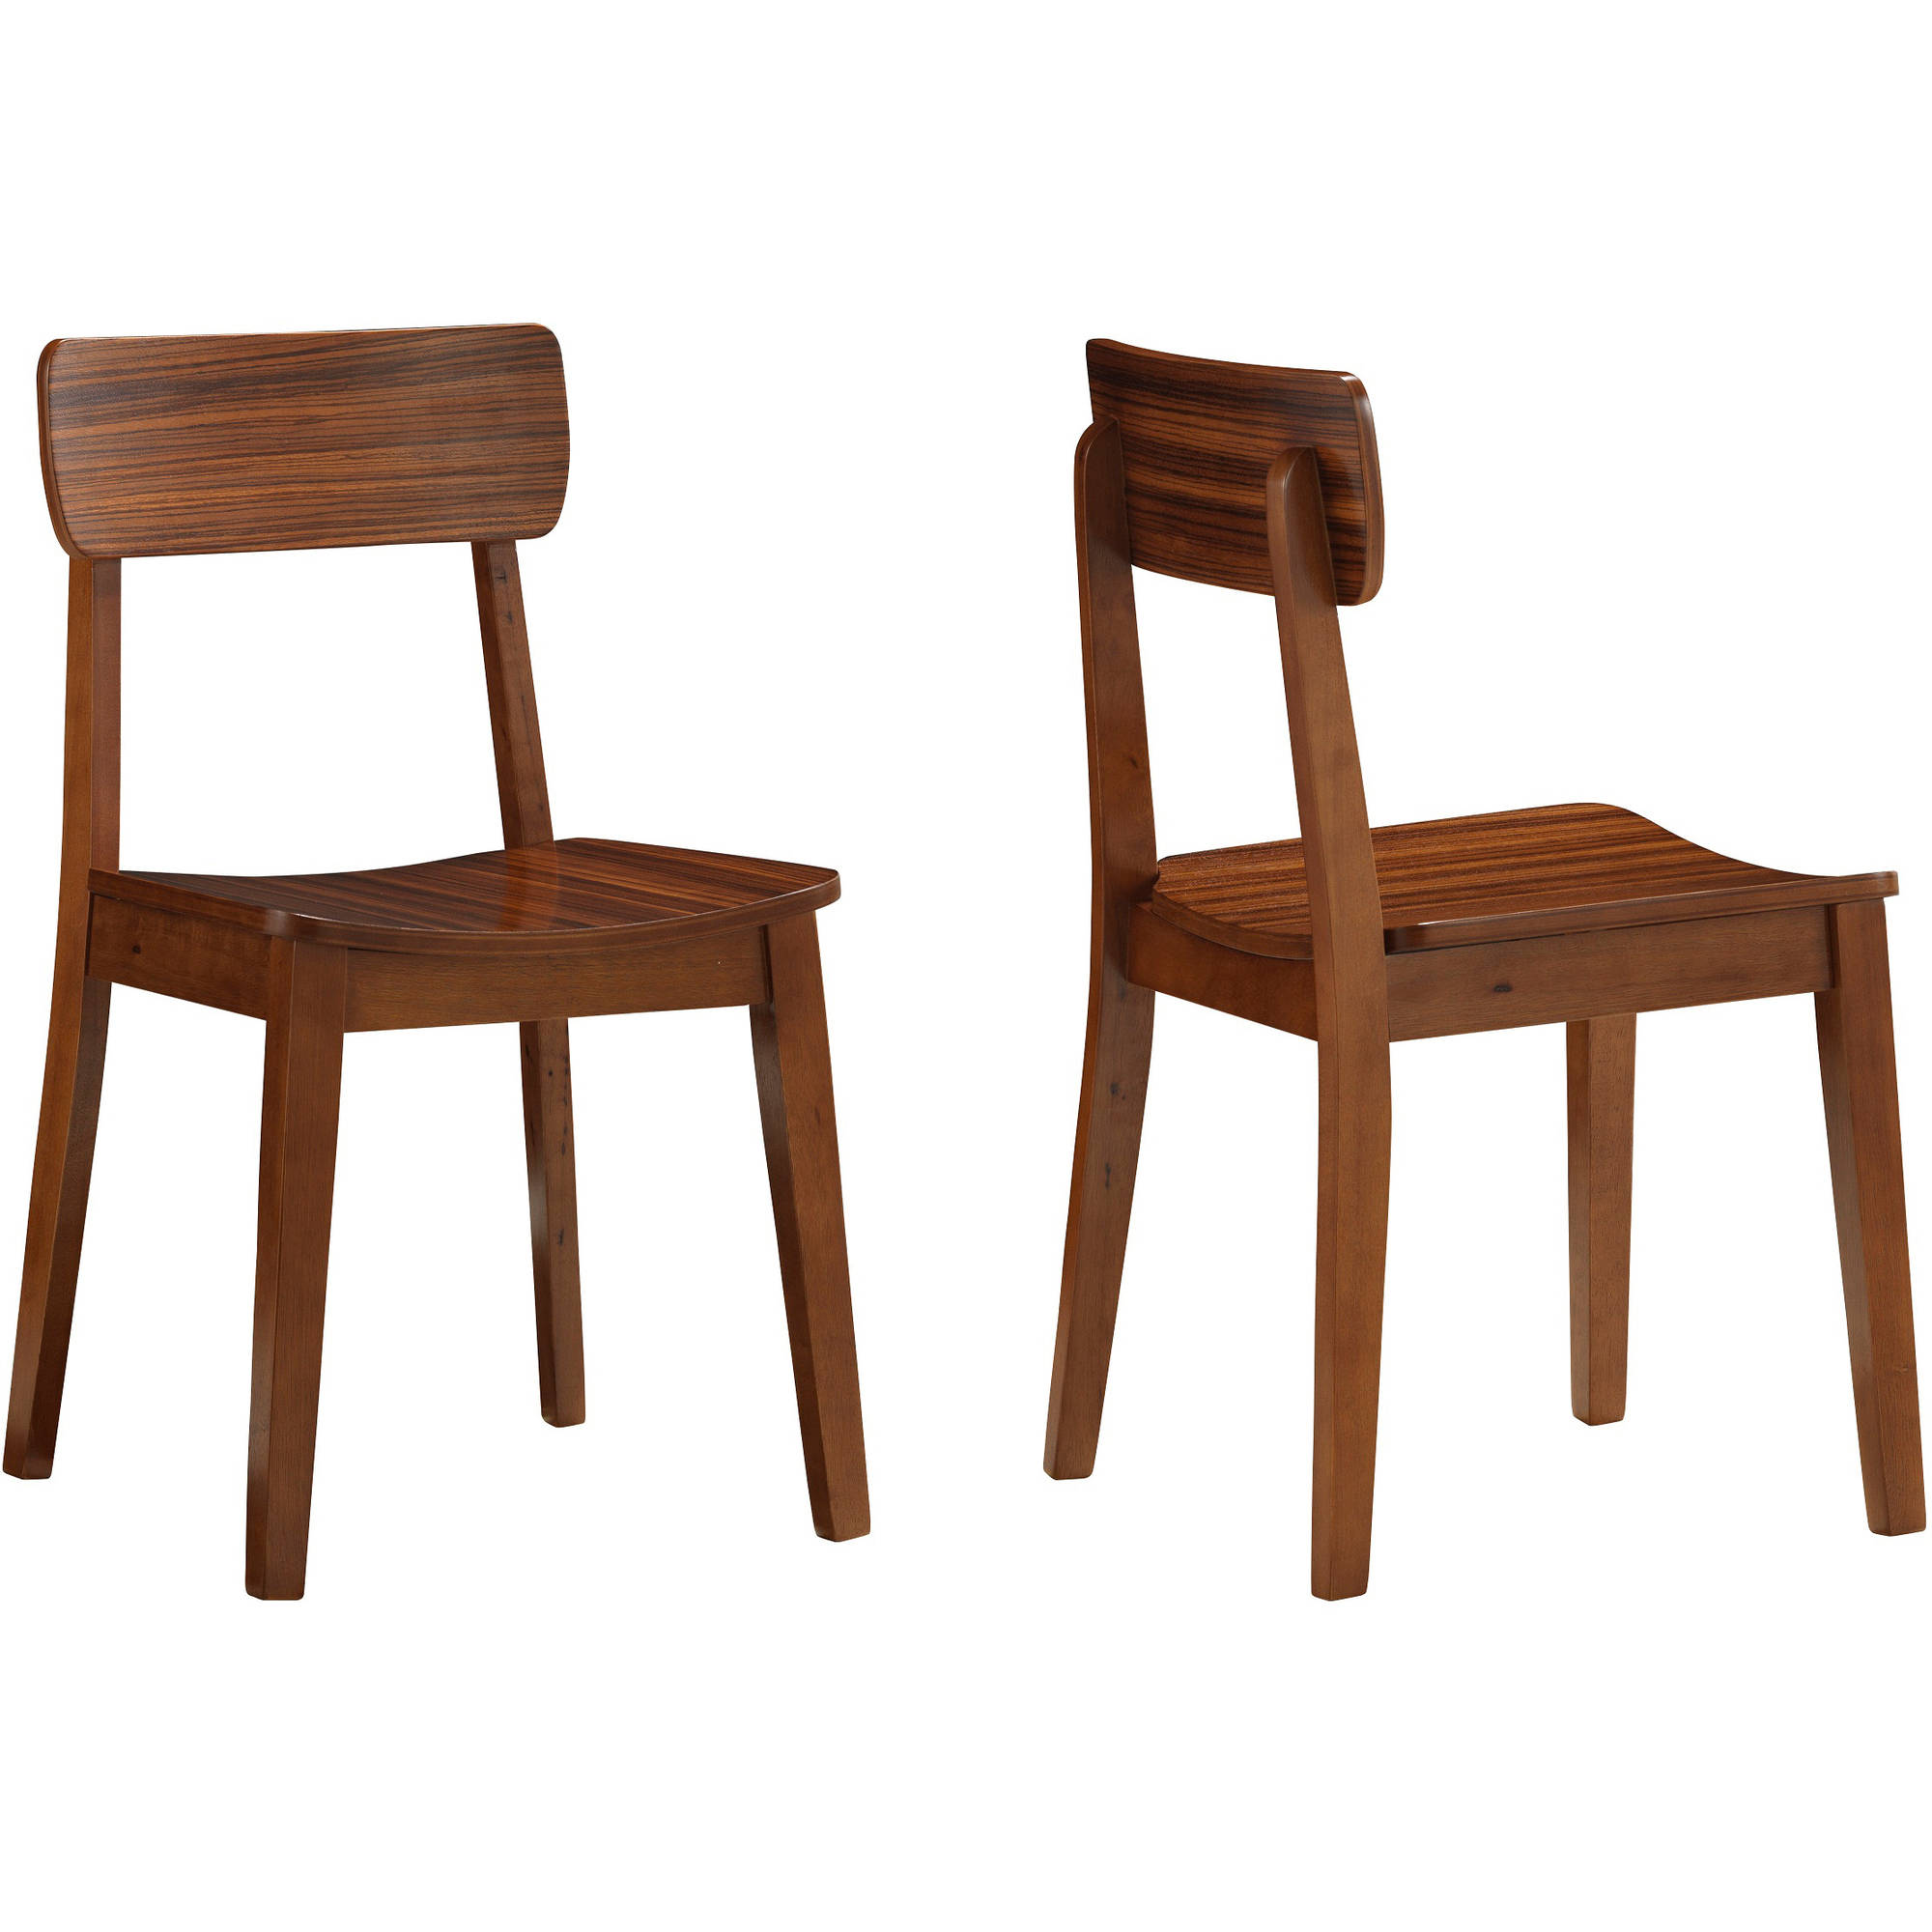 Nice Boraam Zebra Series Hagen Dining Chairs, Set Of 2, Walnut   Walmart.com